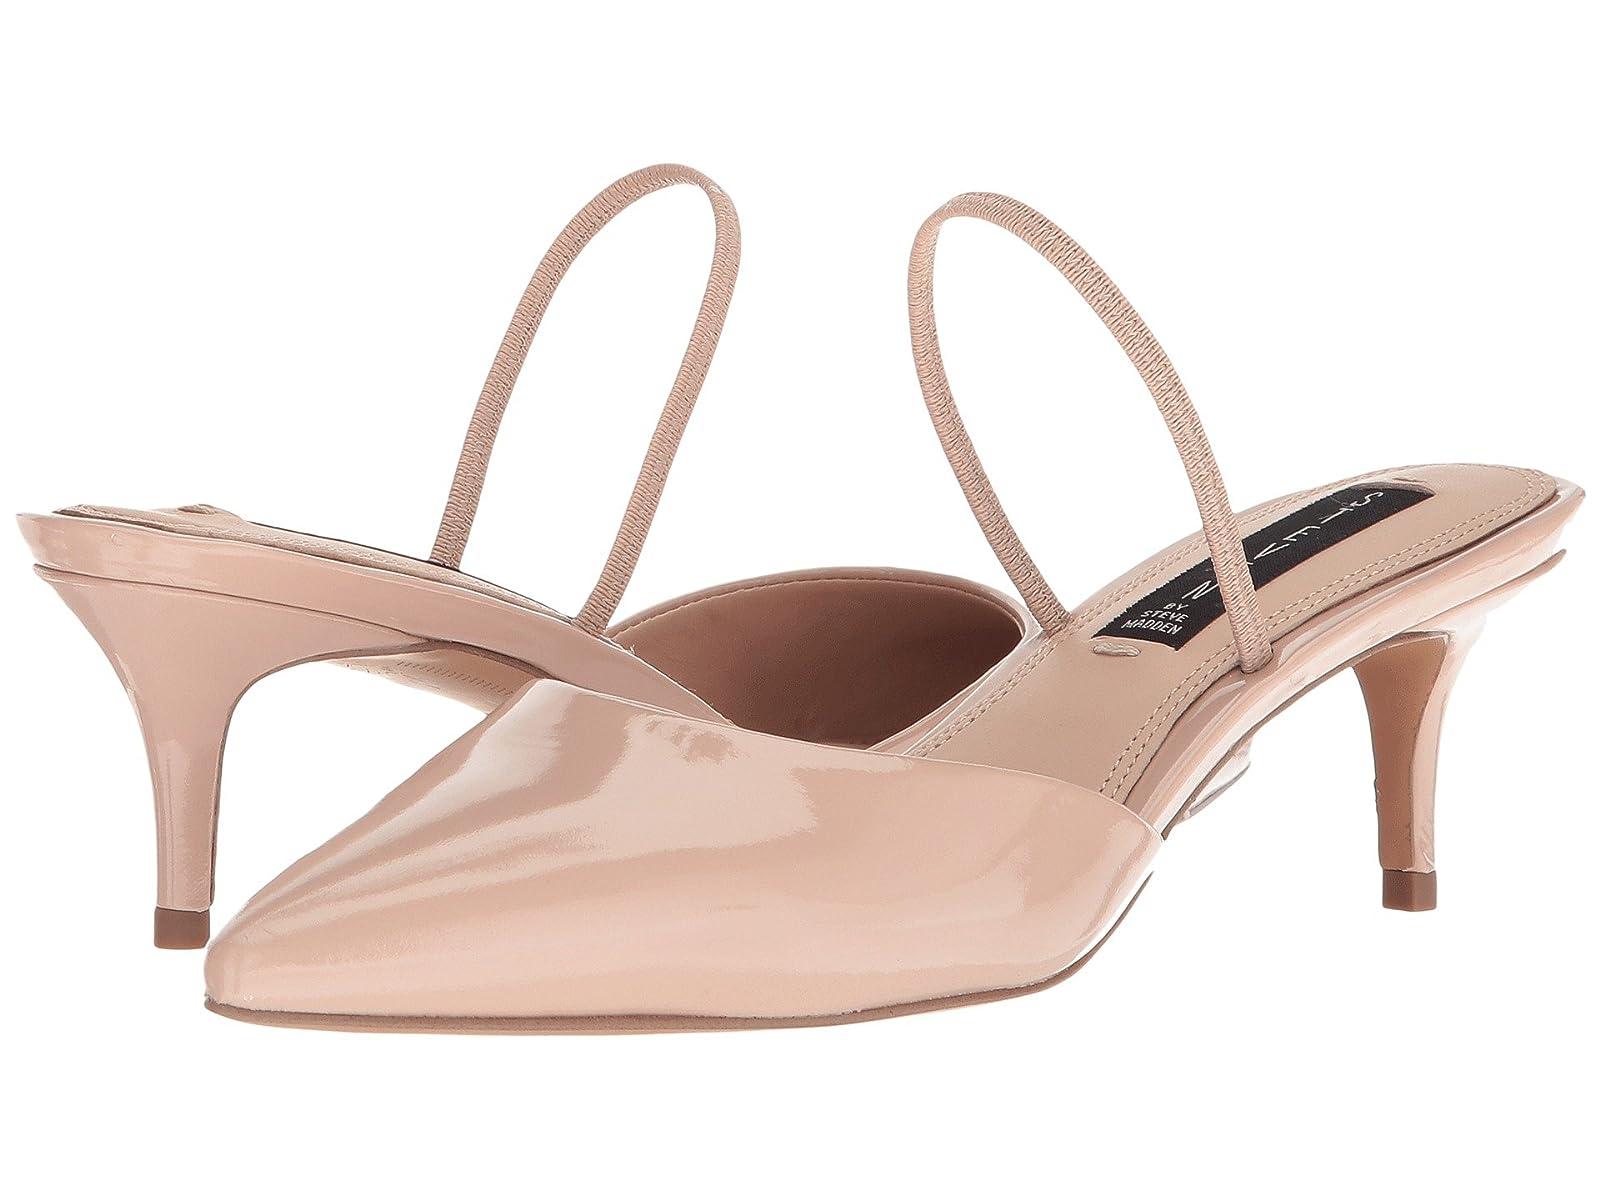 Steven KrispCheap and distinctive eye-catching shoes